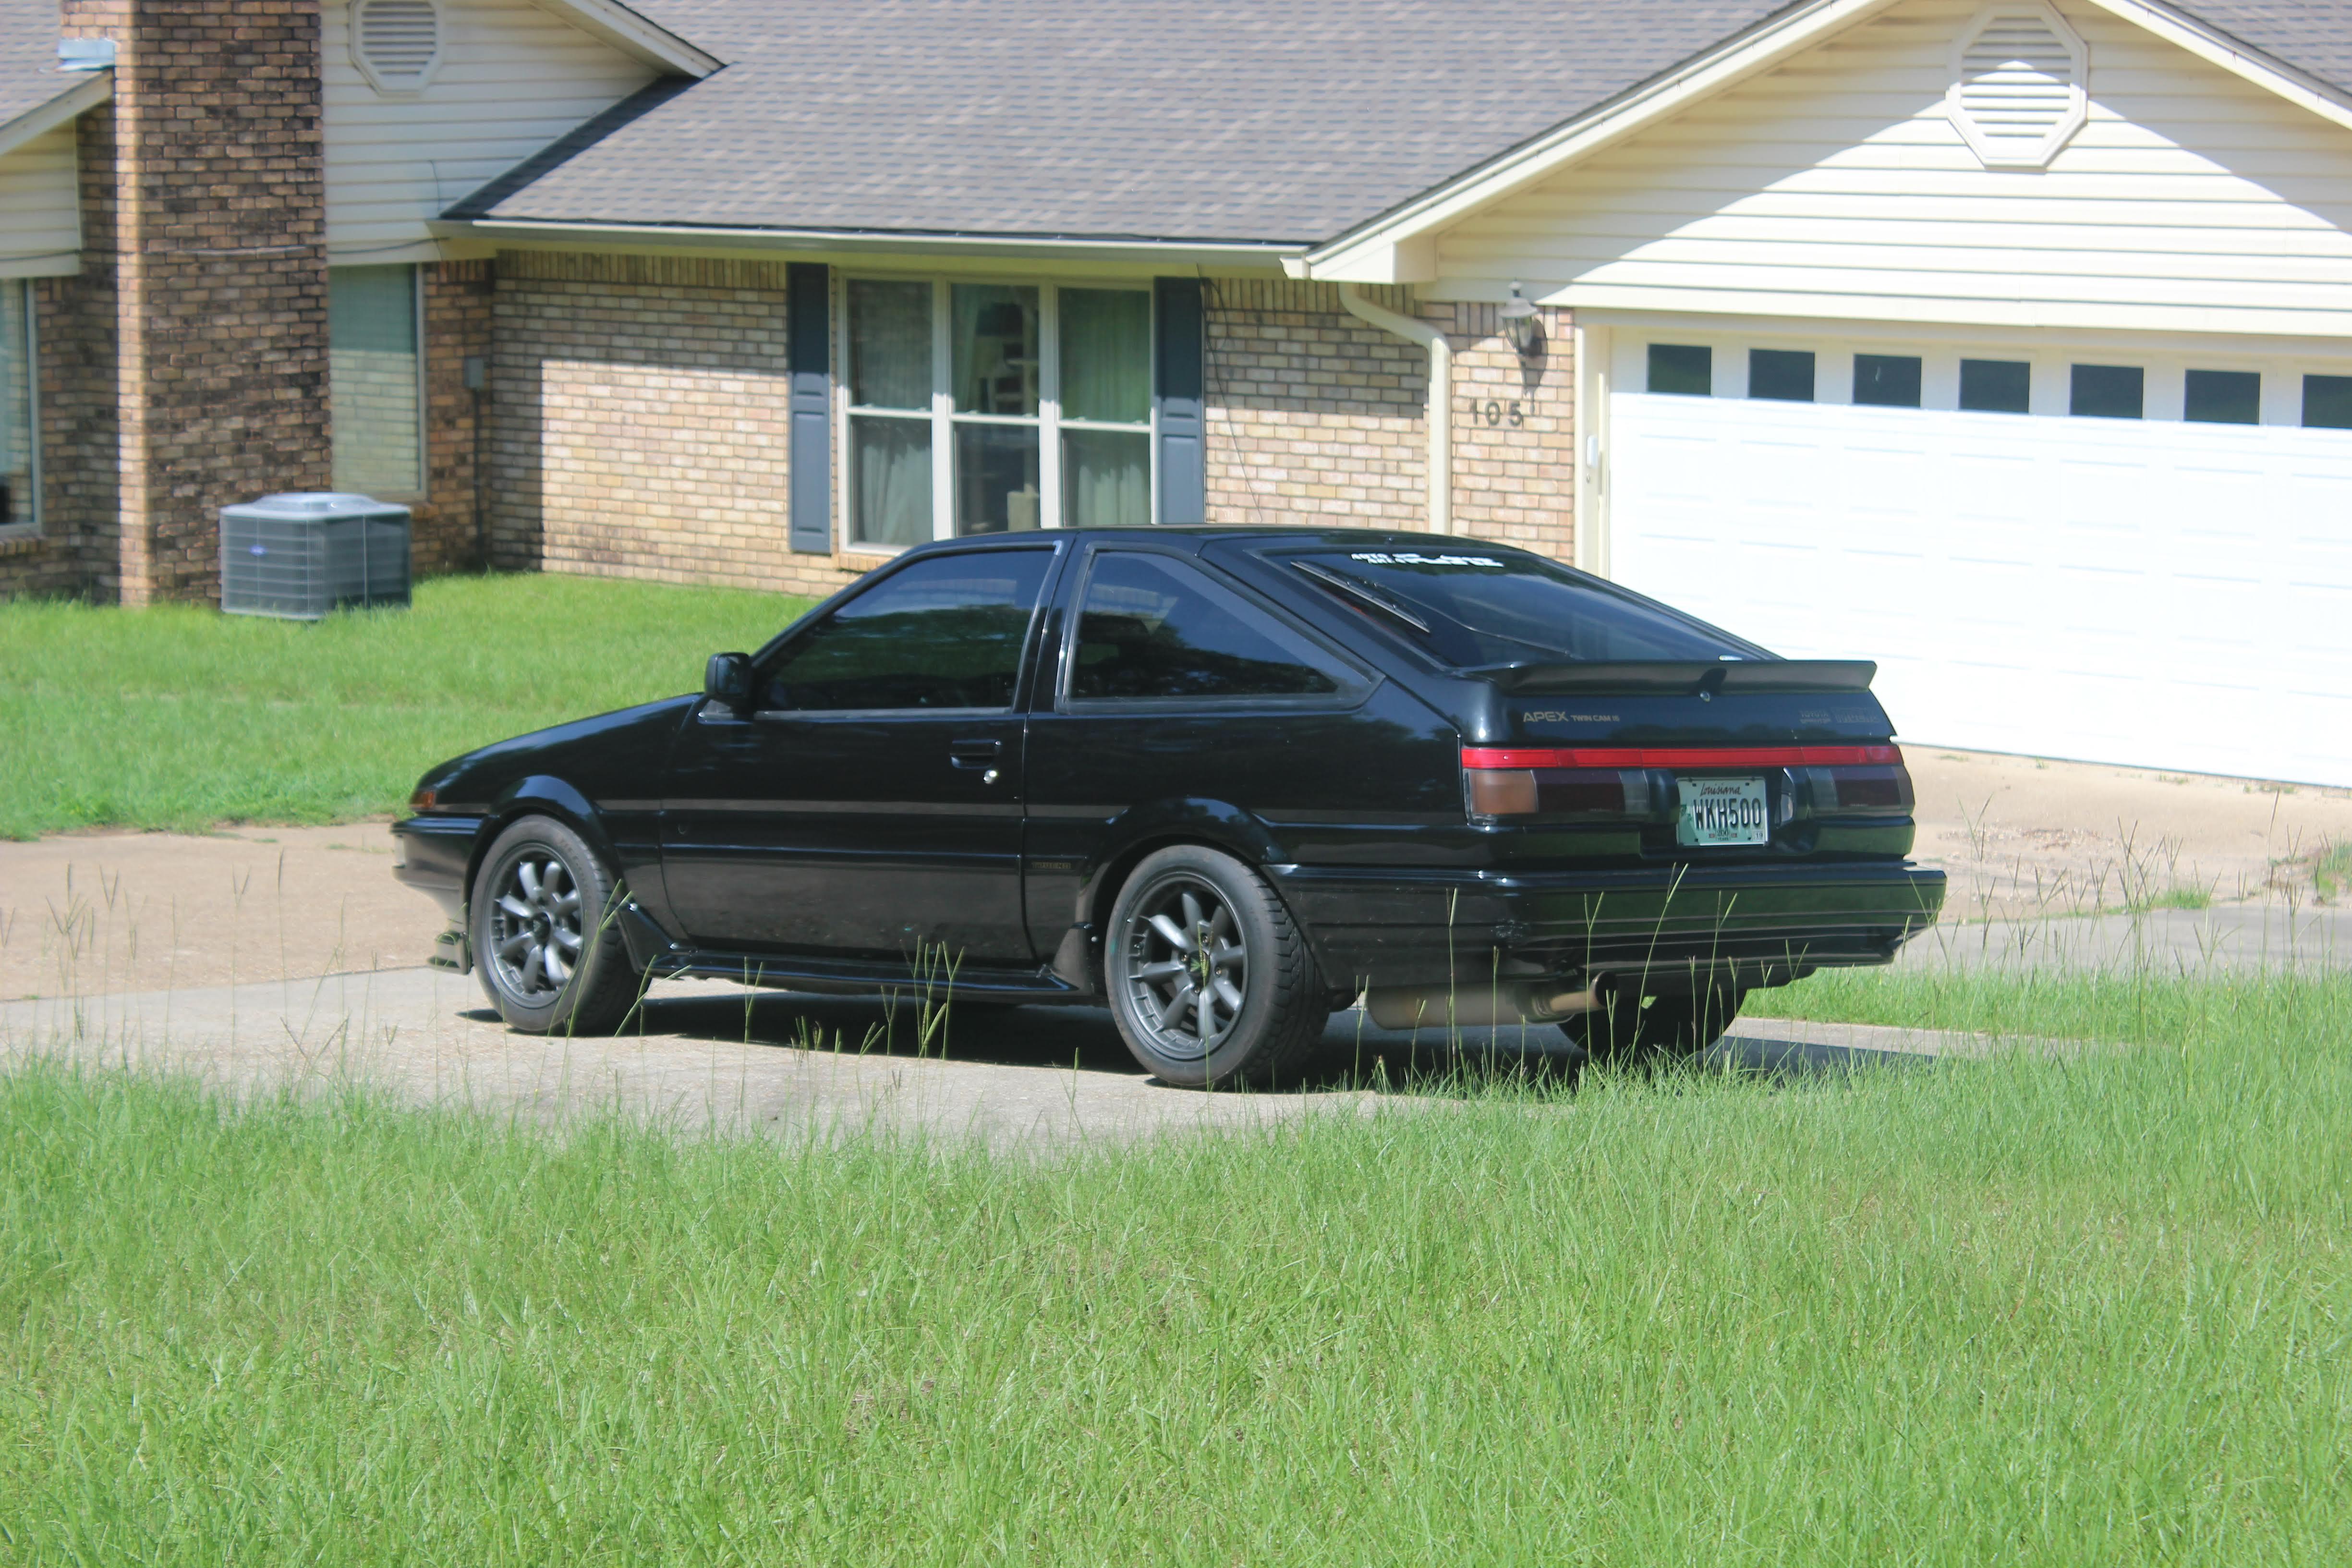 1985 Toyota Trueno Sprinter GT-APEX, 126k miles-img_3006-jpg